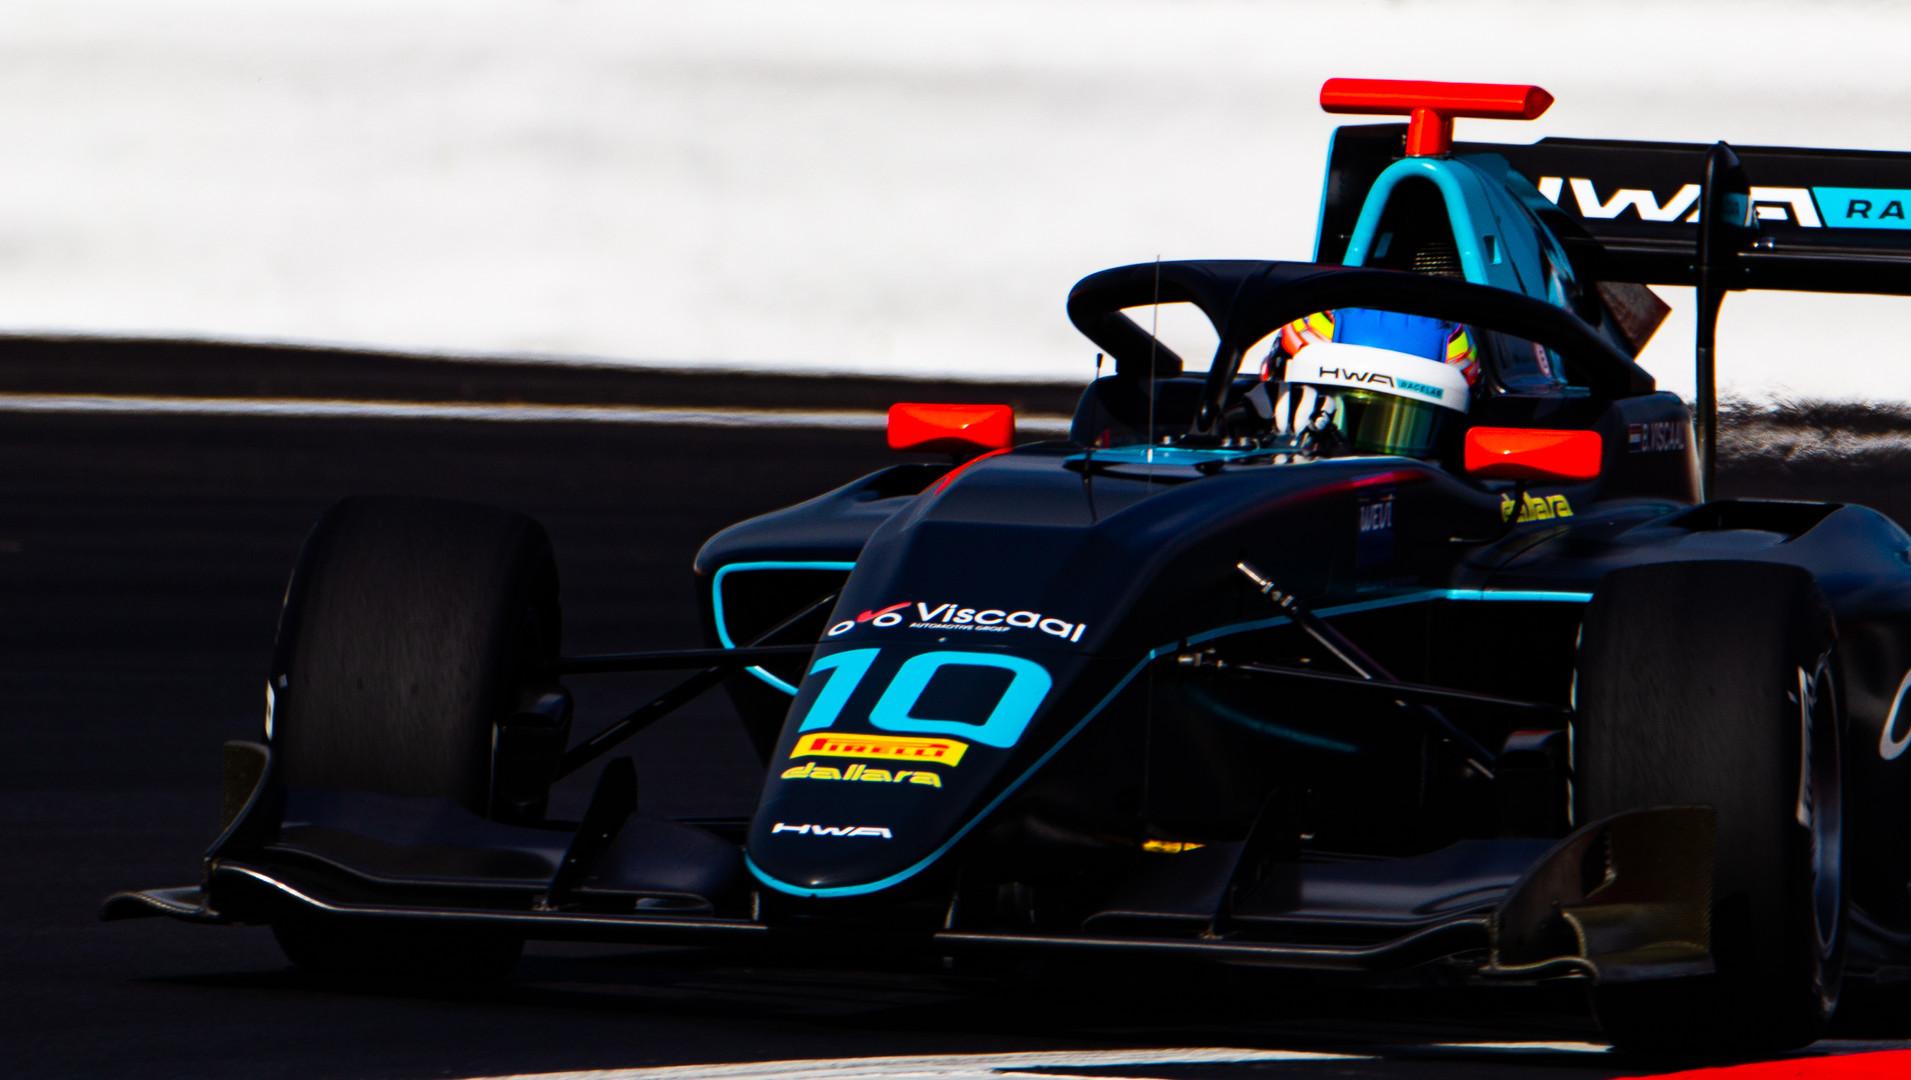 Bent F3 Silverstone 14-07-2019-3.jpg